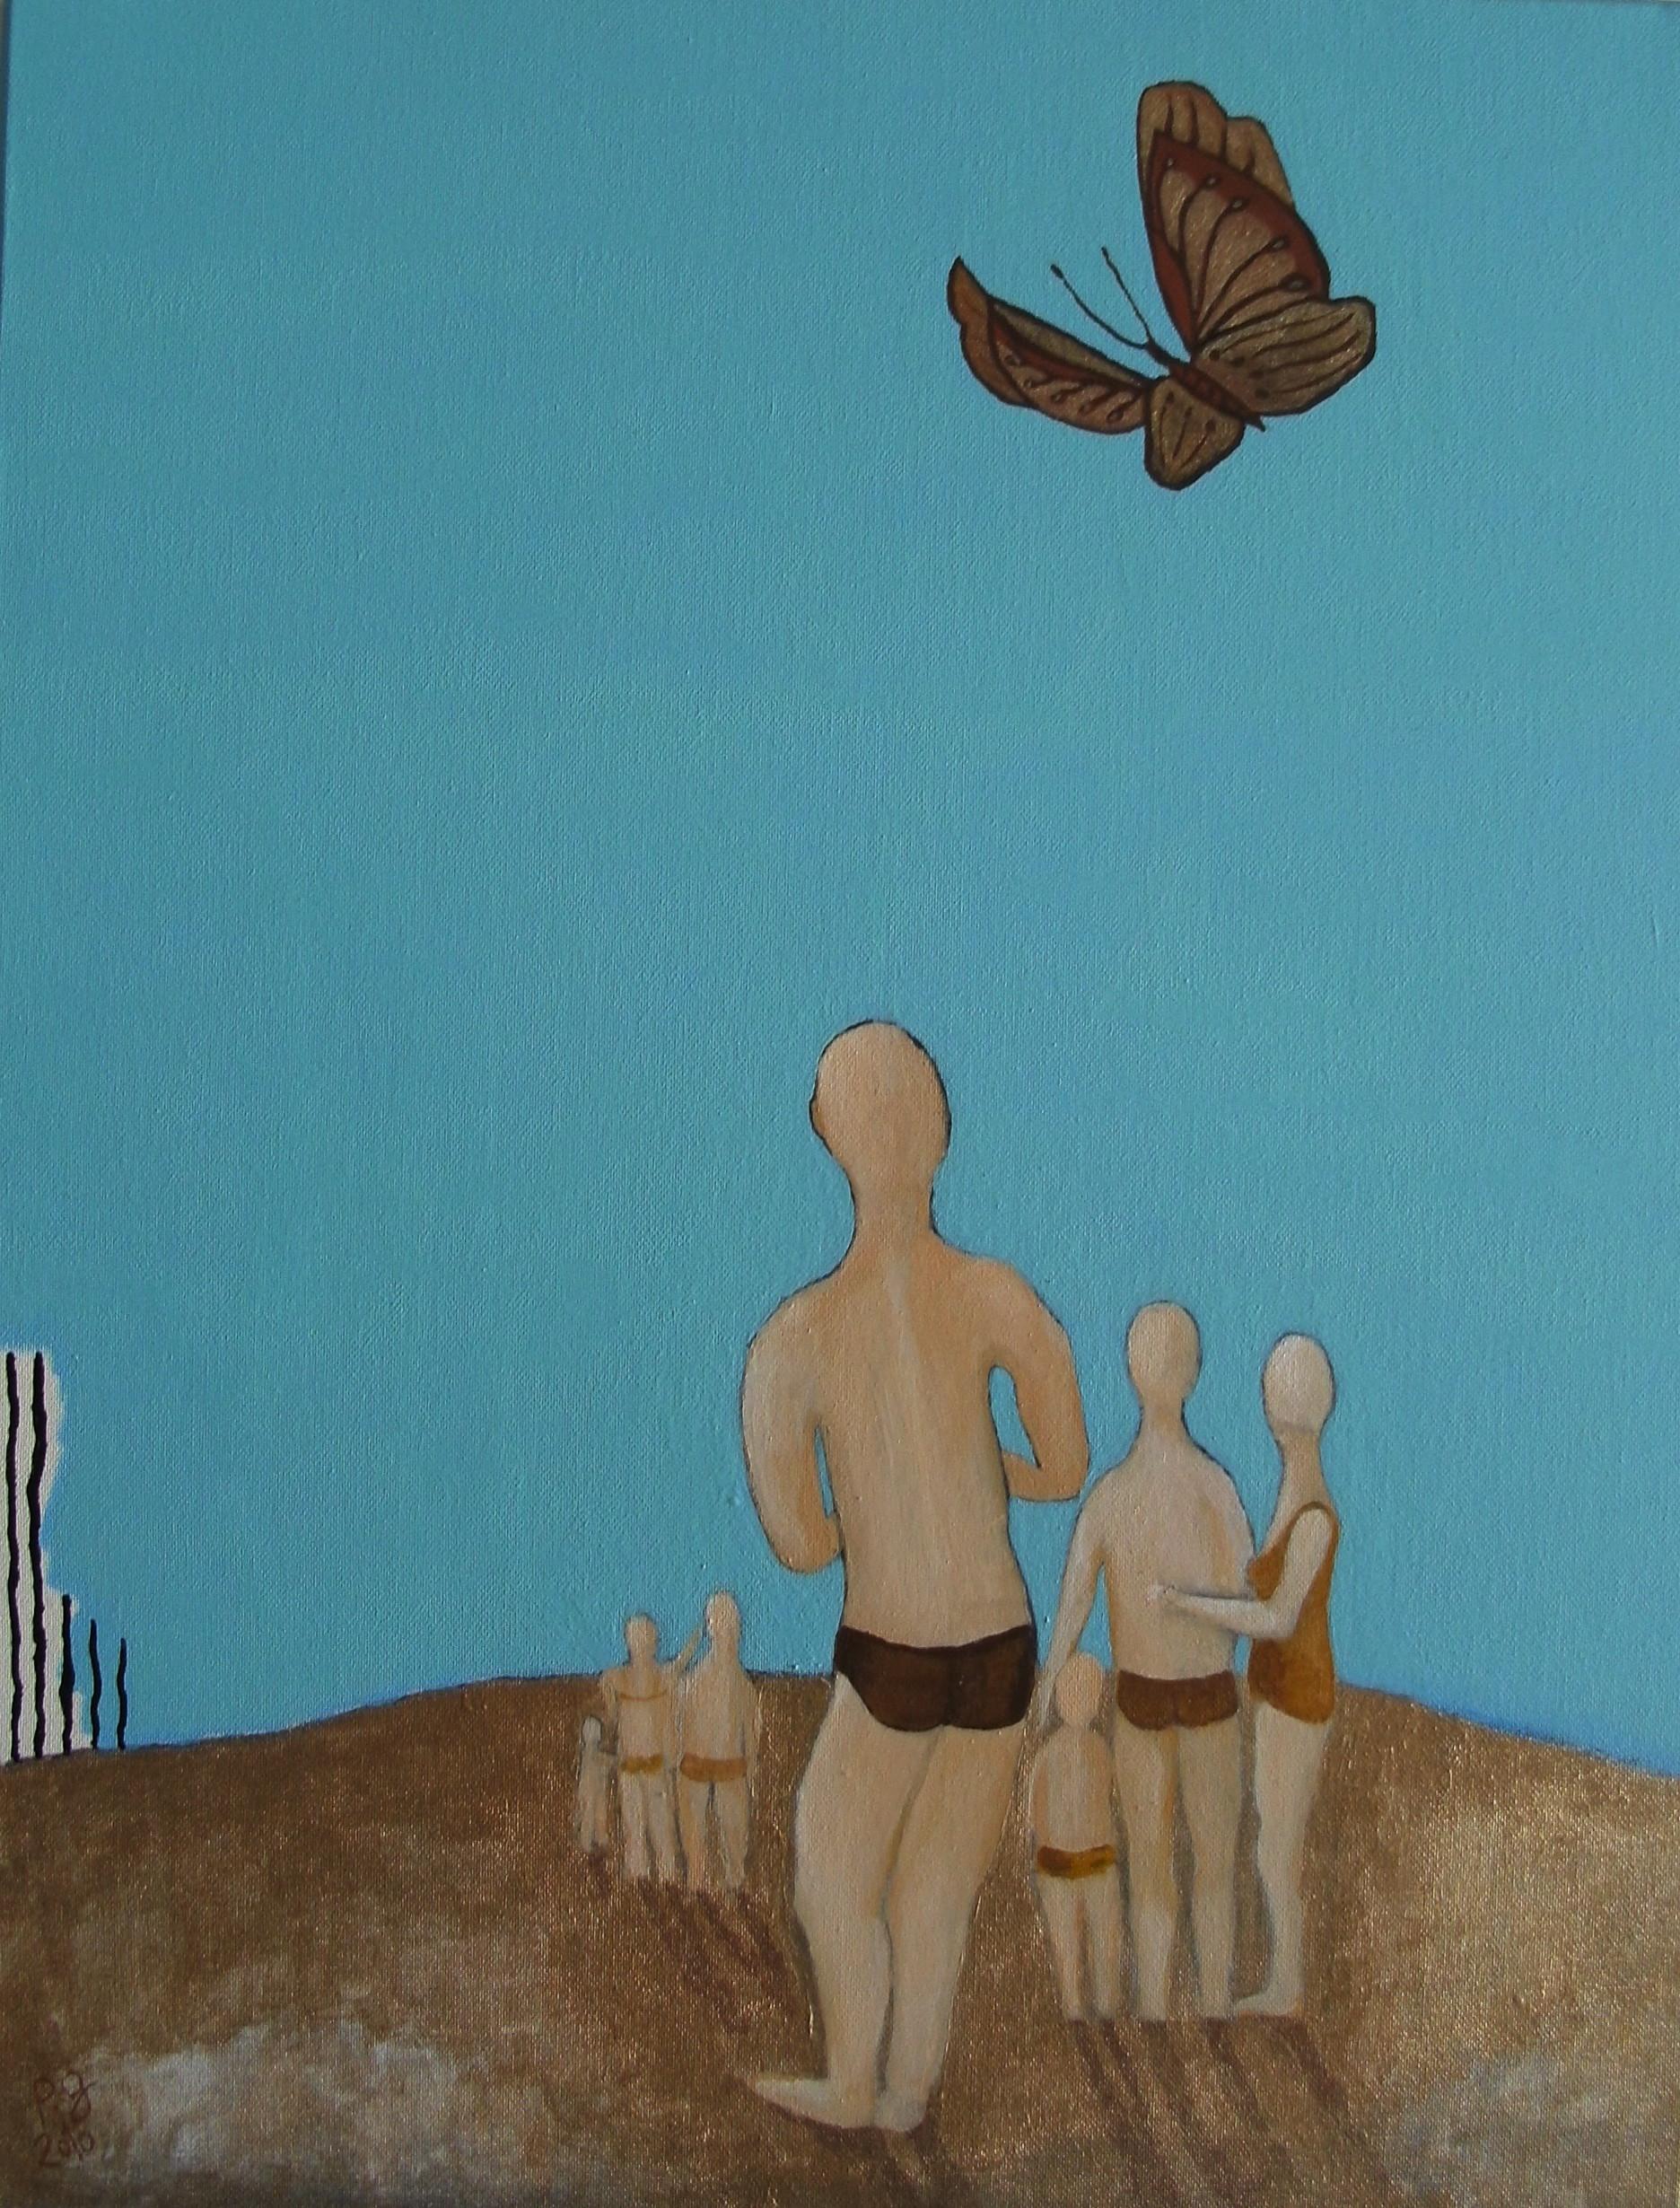 """Le papillon"" - 2010 - p.g. [patrick gourgouillat]"